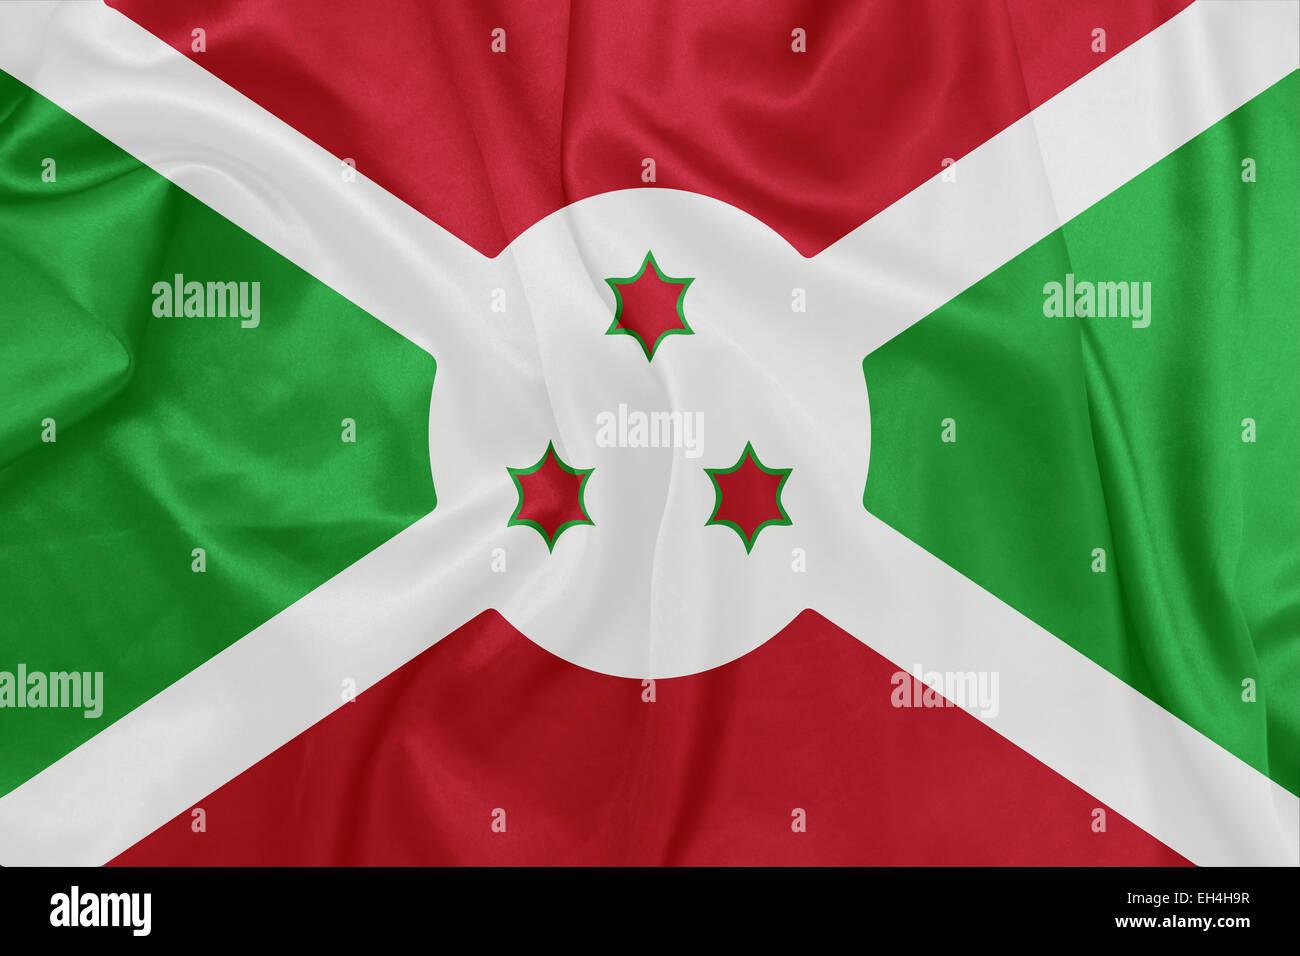 Burundi - Waving national flag on silk texture - Stock Image